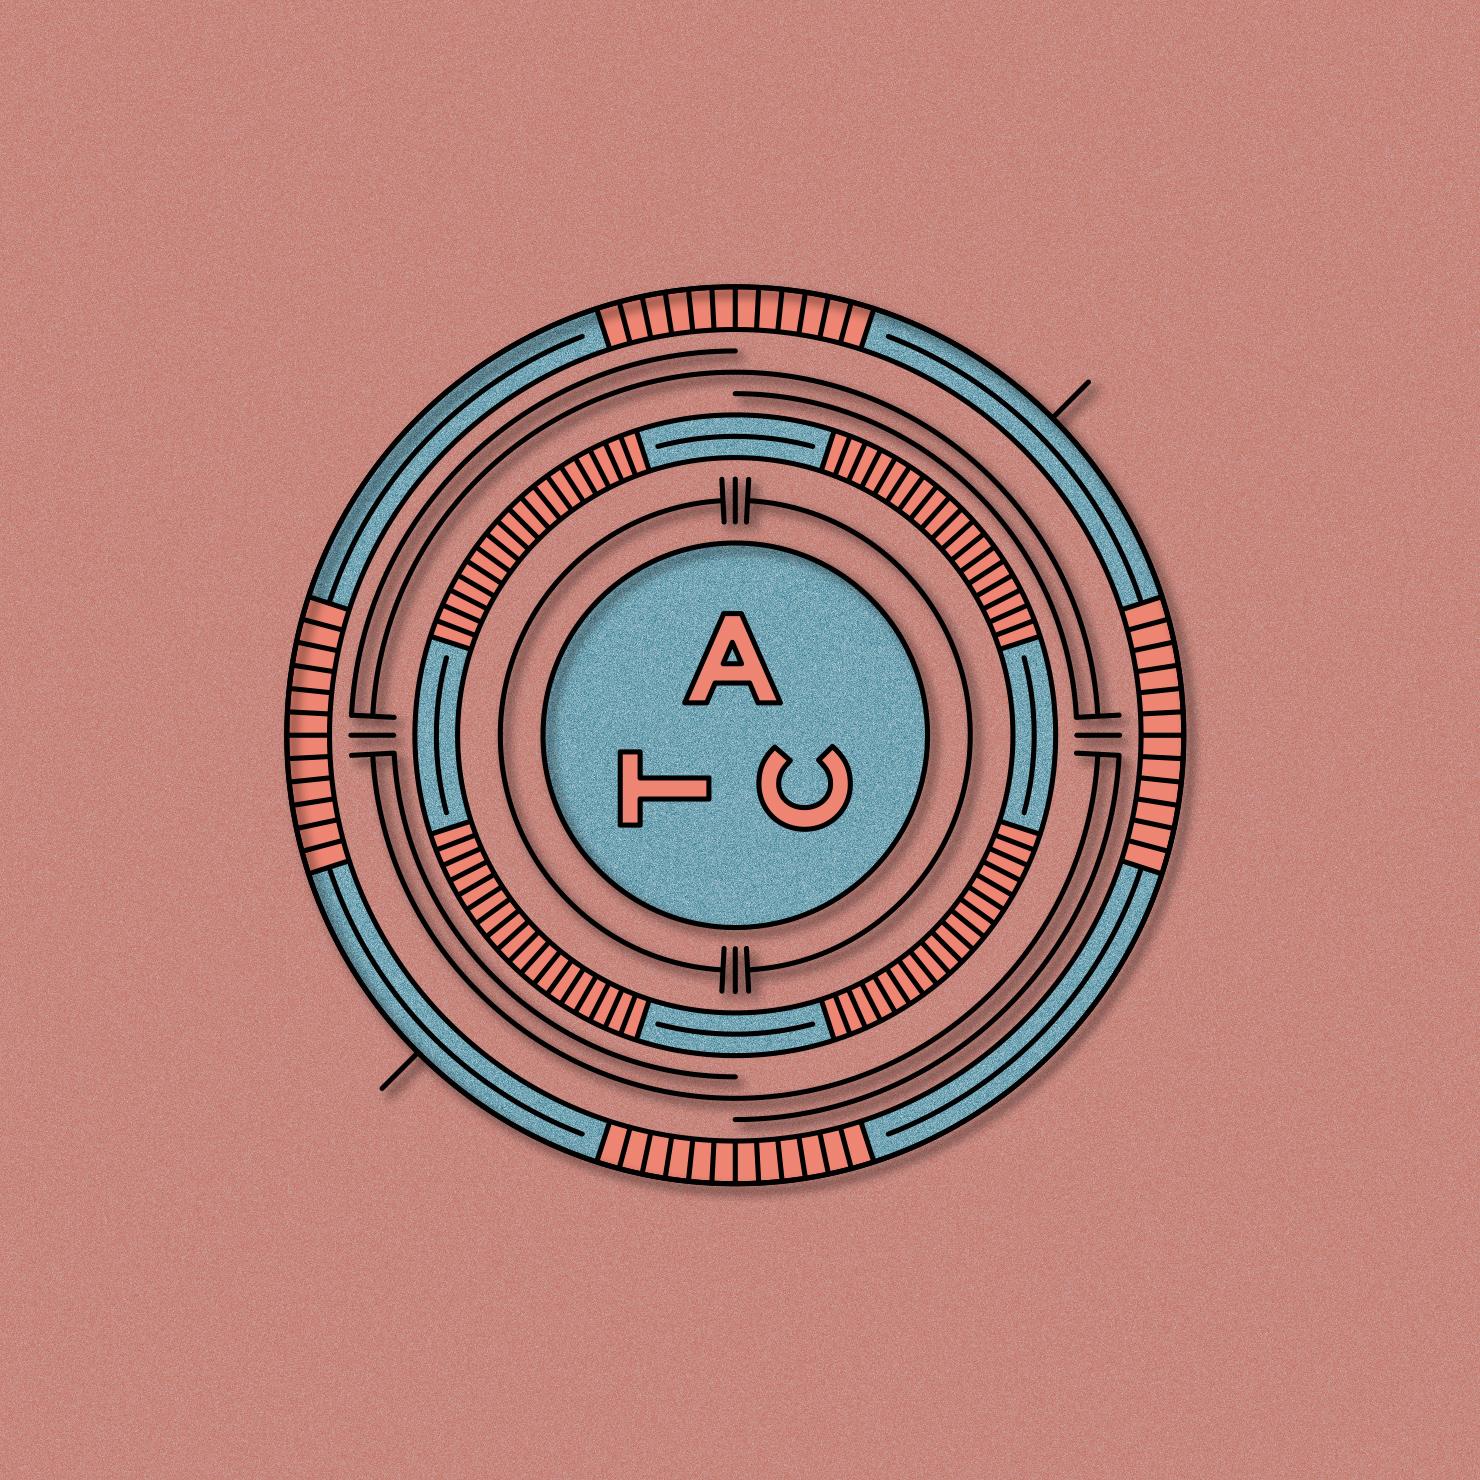 ATC Artist Series Pablo Tradacete Letter Logo